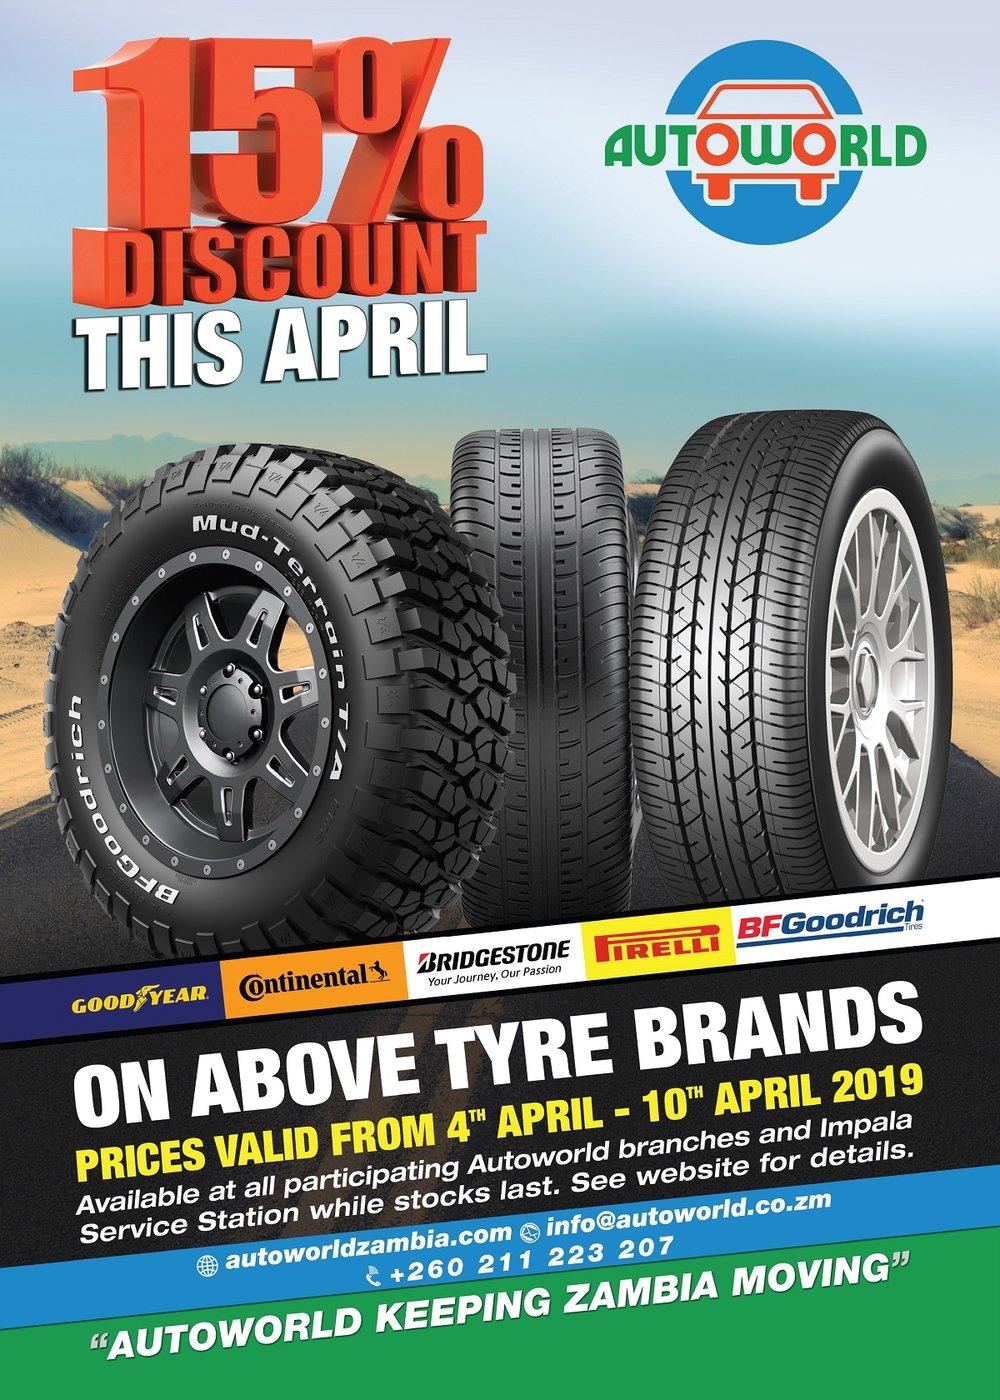 Autoworld_Tyre_Special_April_2019.jpg